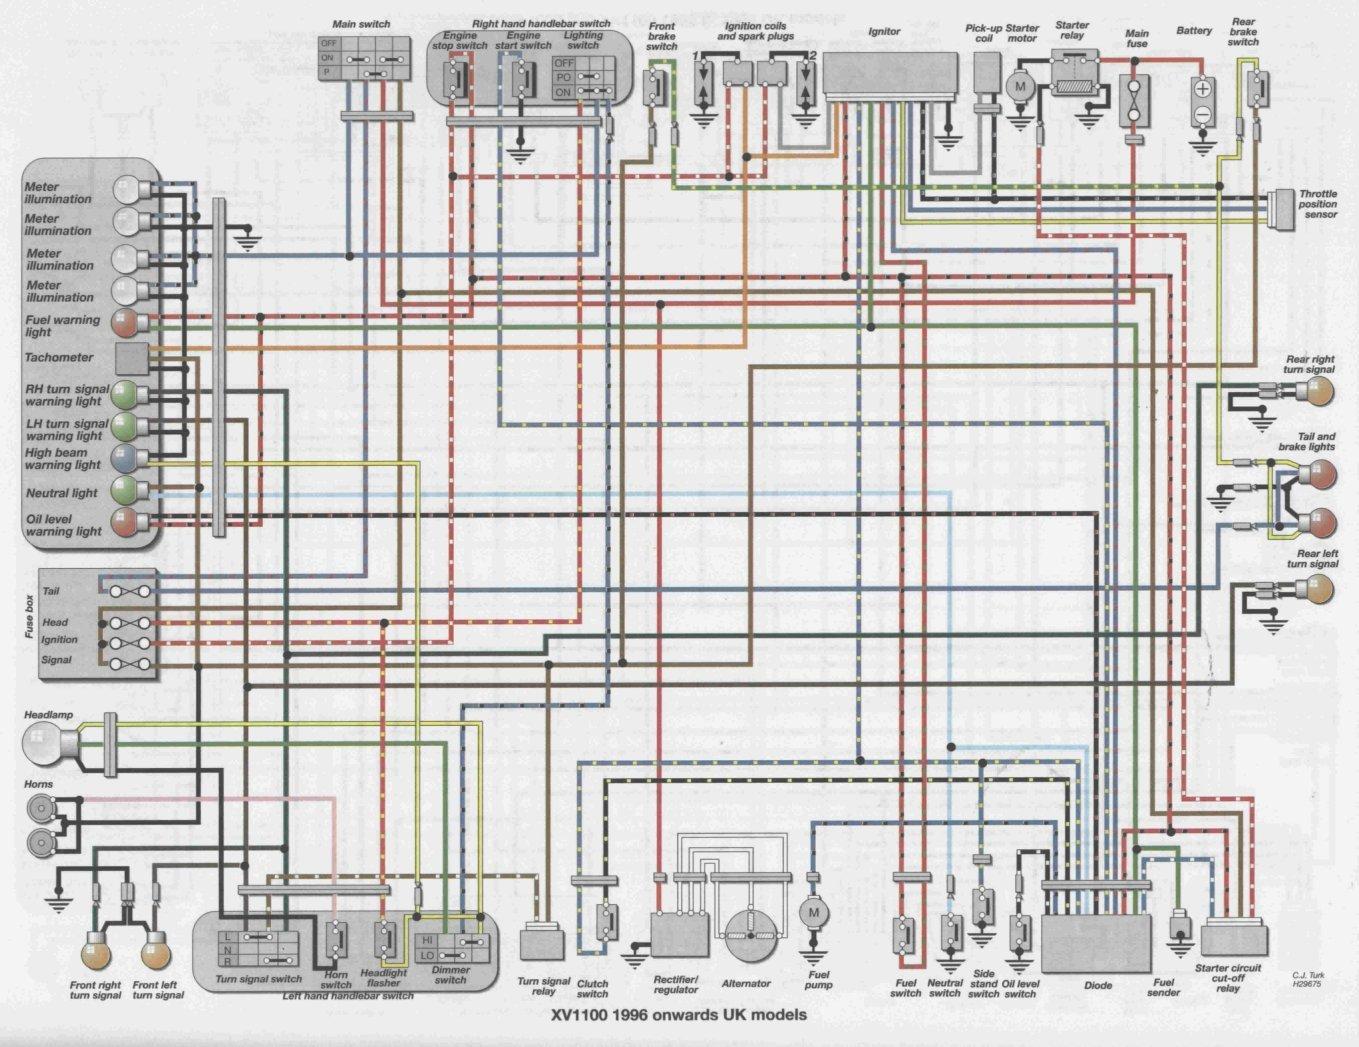 [ZHKZ_3066]  TL_2205] 1994 Yamaha 750 Virago Wiring Diagram Free Diagram | Virago 1100 Wiring Diagram |  | Ation Syny Momece None Inki Isra Mohammedshrine Librar Wiring 101